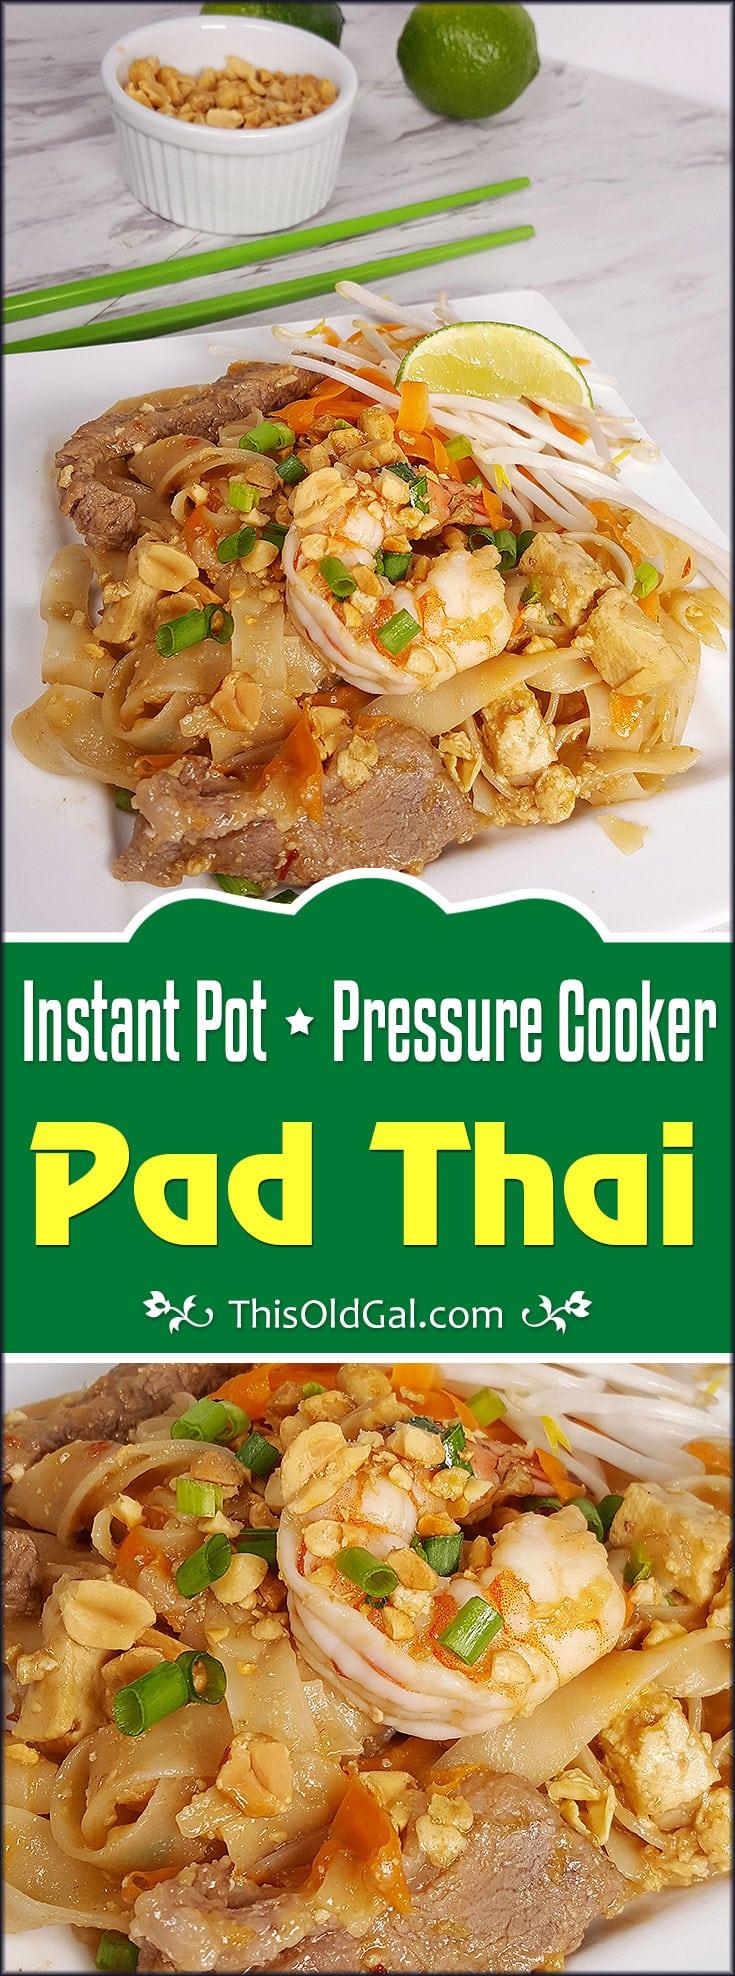 Instant Pot Chicken & Pork Pad Thai Shrimp